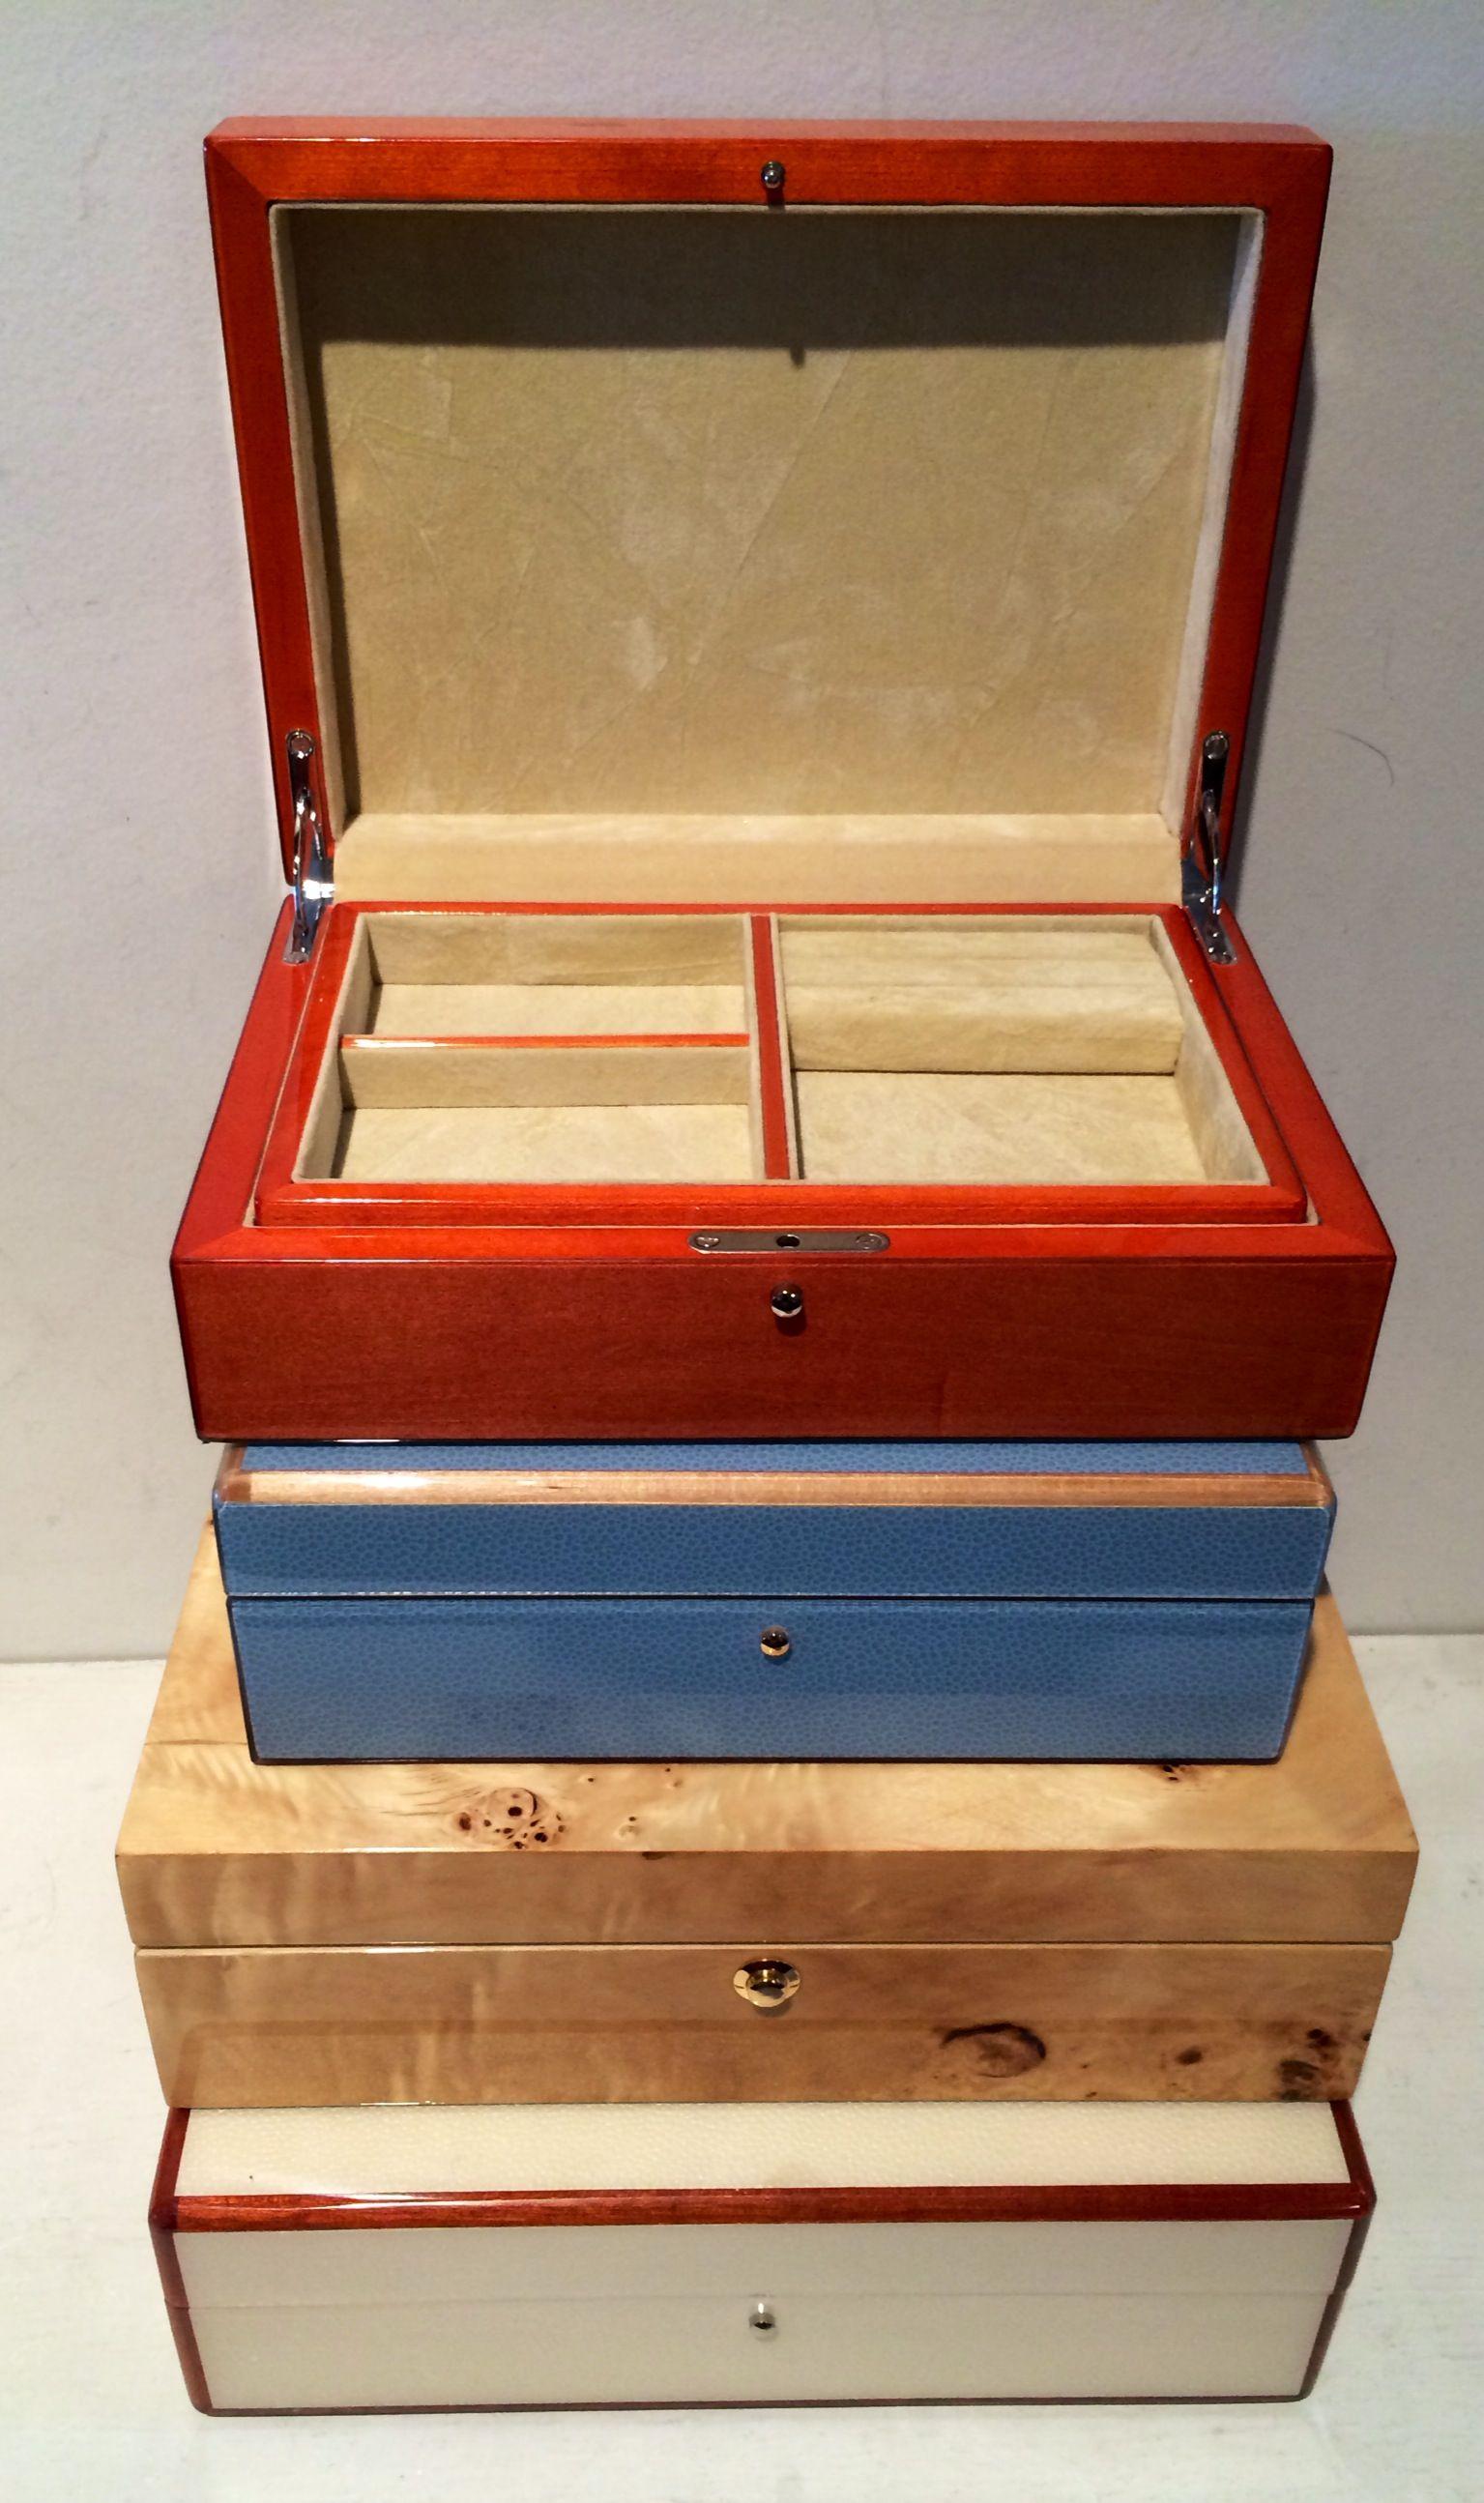 Tizo Italian Wood Jewelry Boxes These elegant wooden boxes are